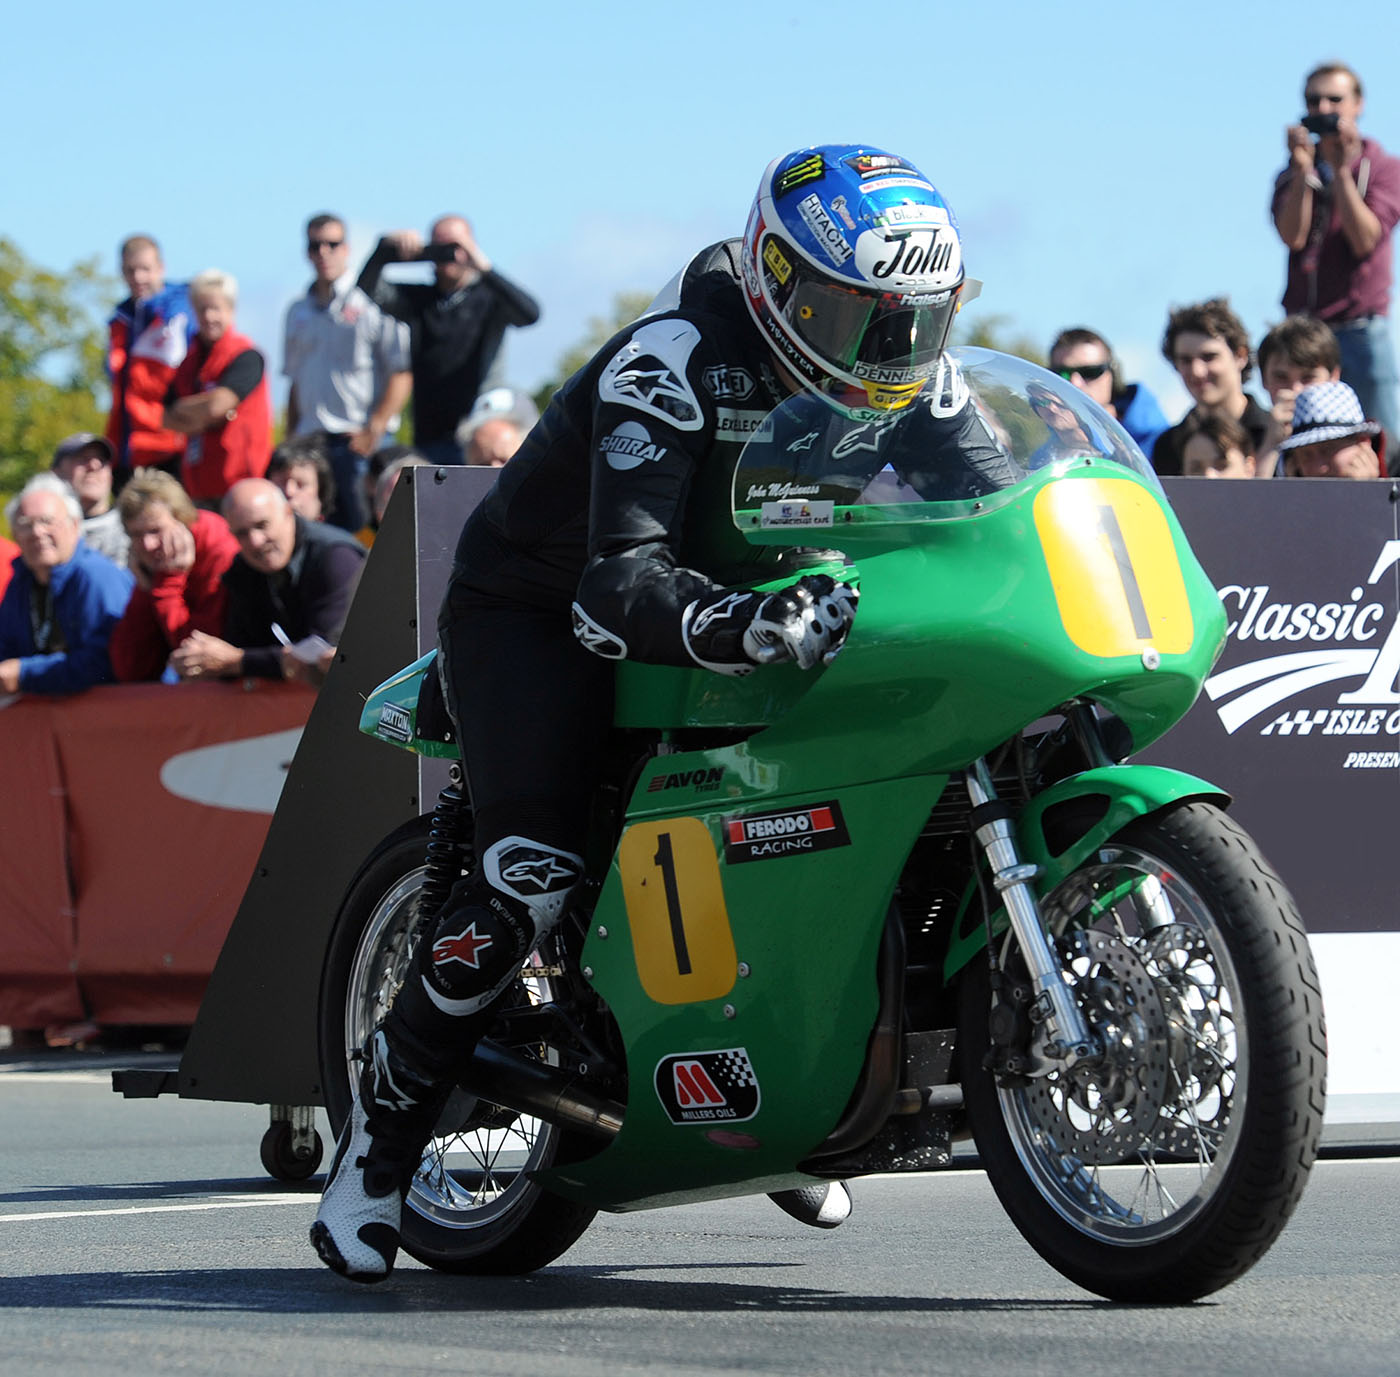 John McGuinness Classic TT